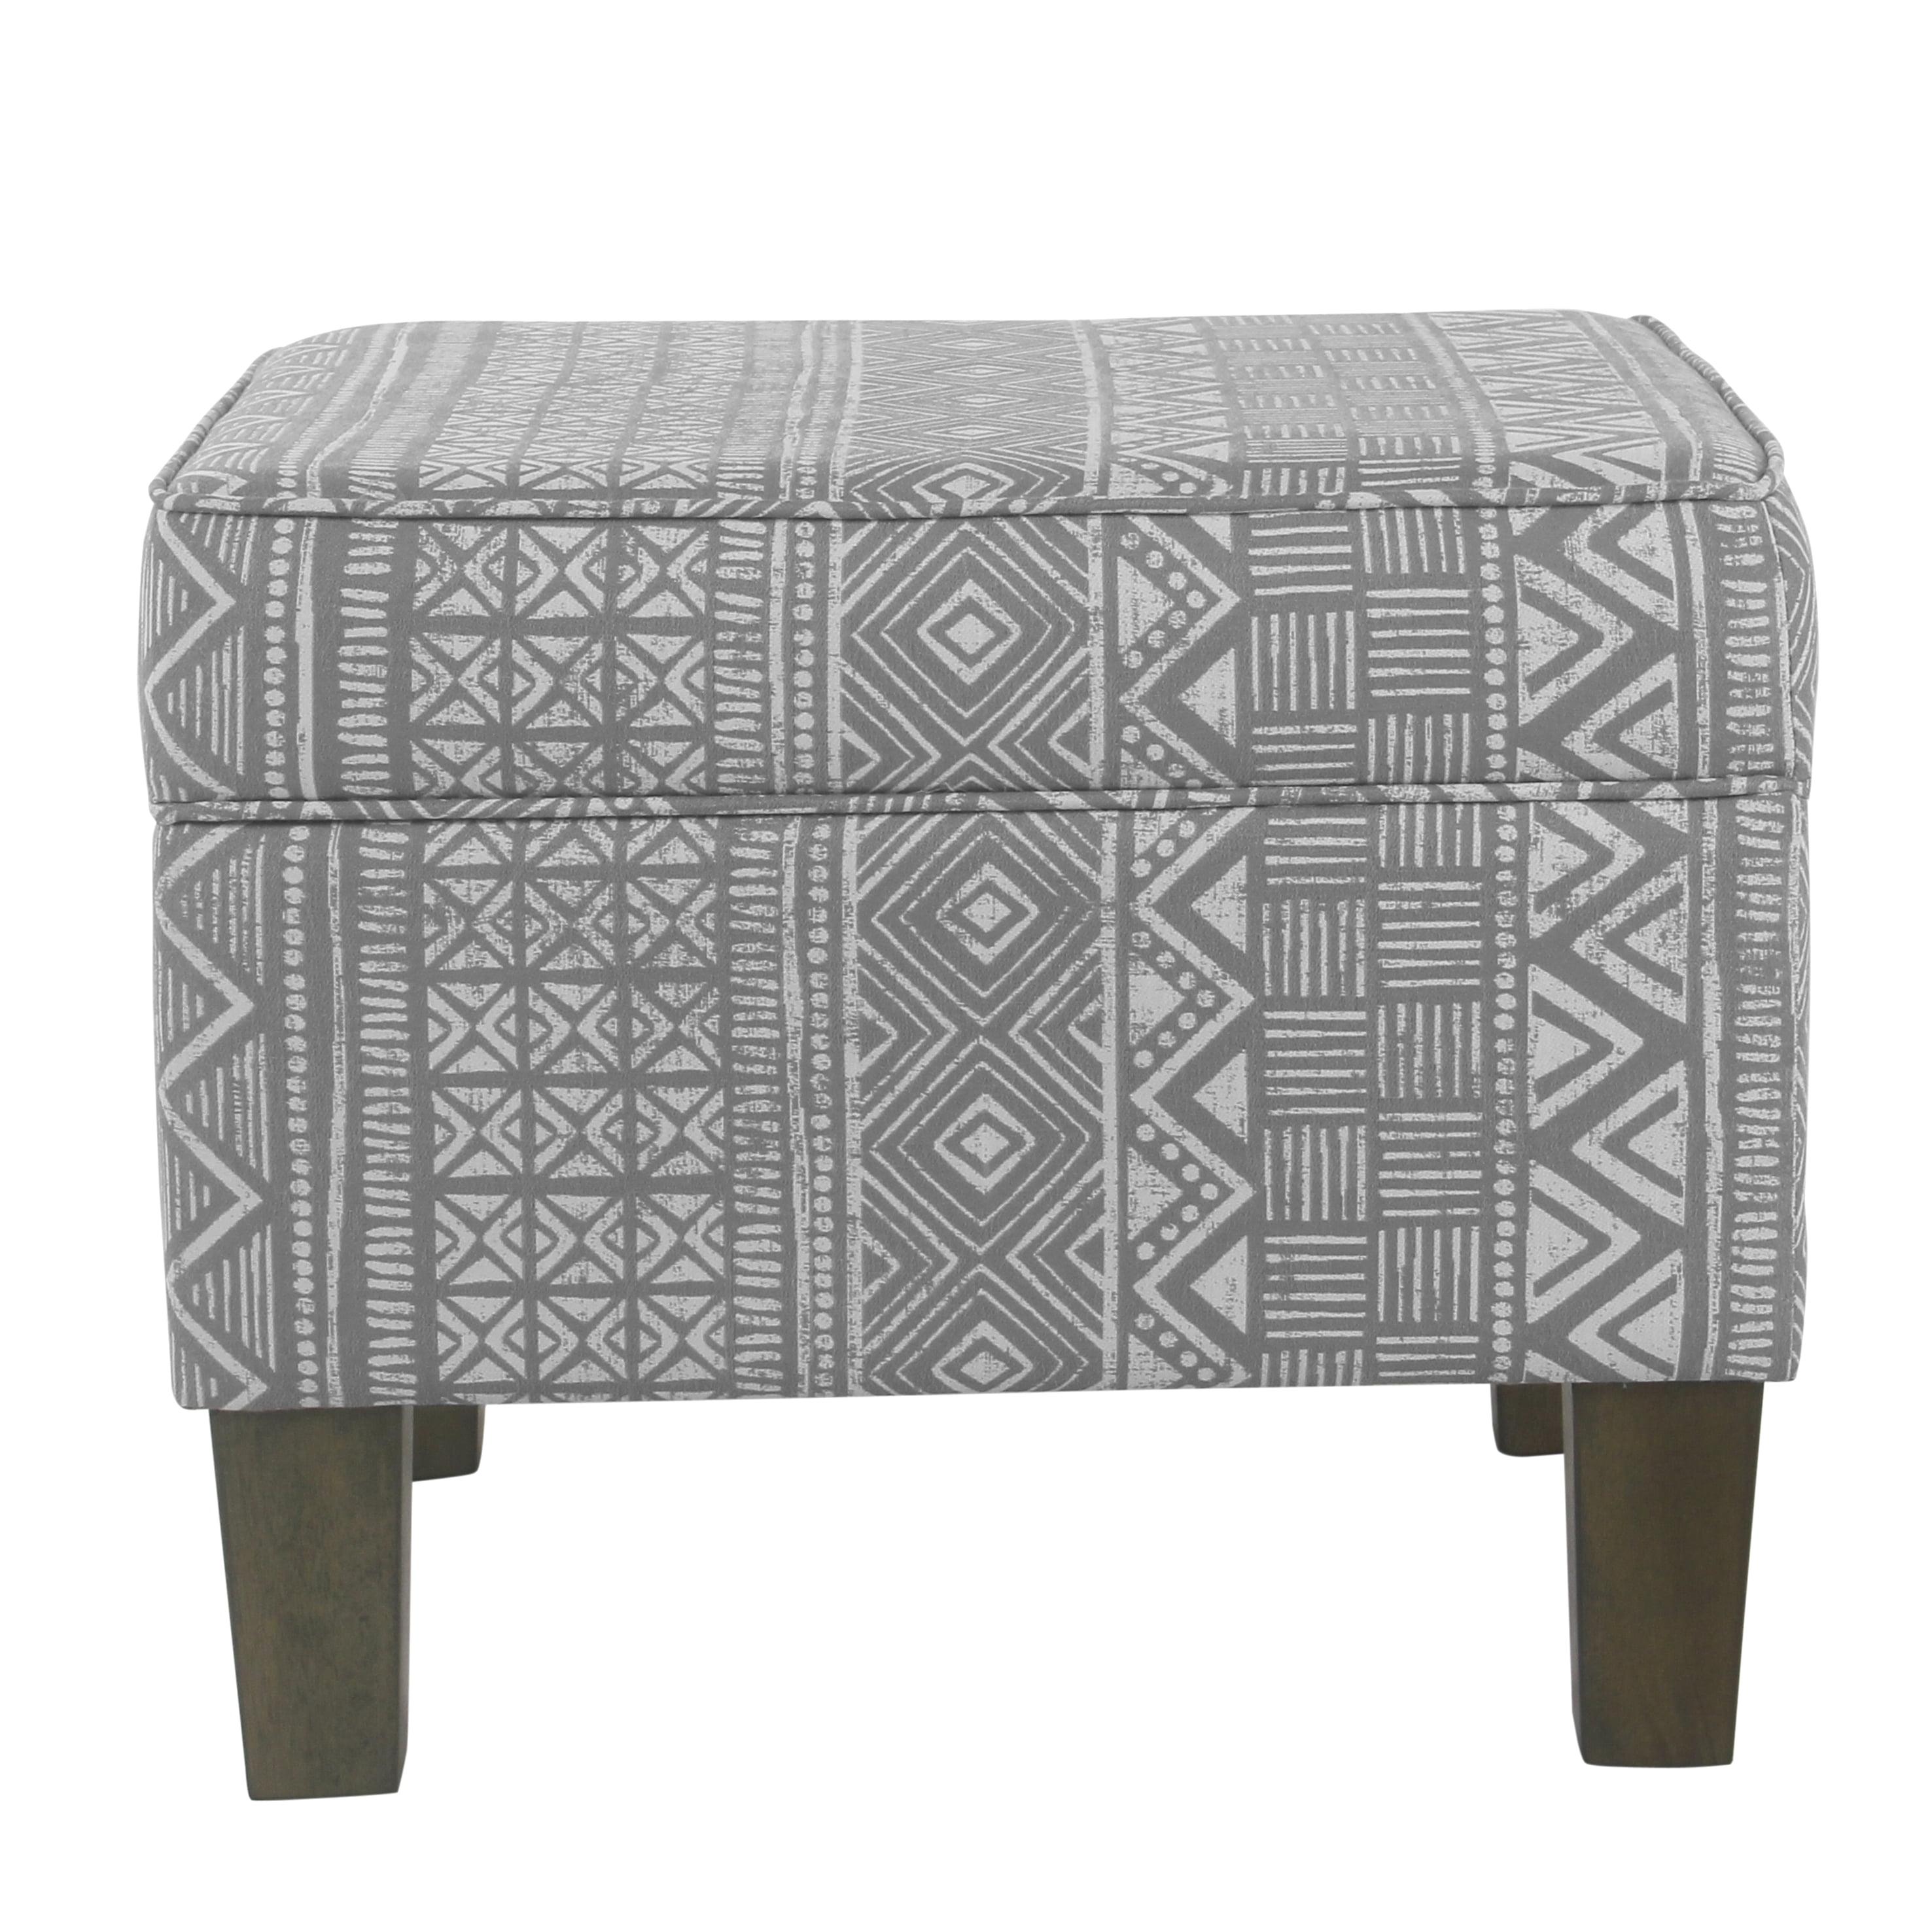 HomePop Medium Decorative Storage Bench, Multiple Colors